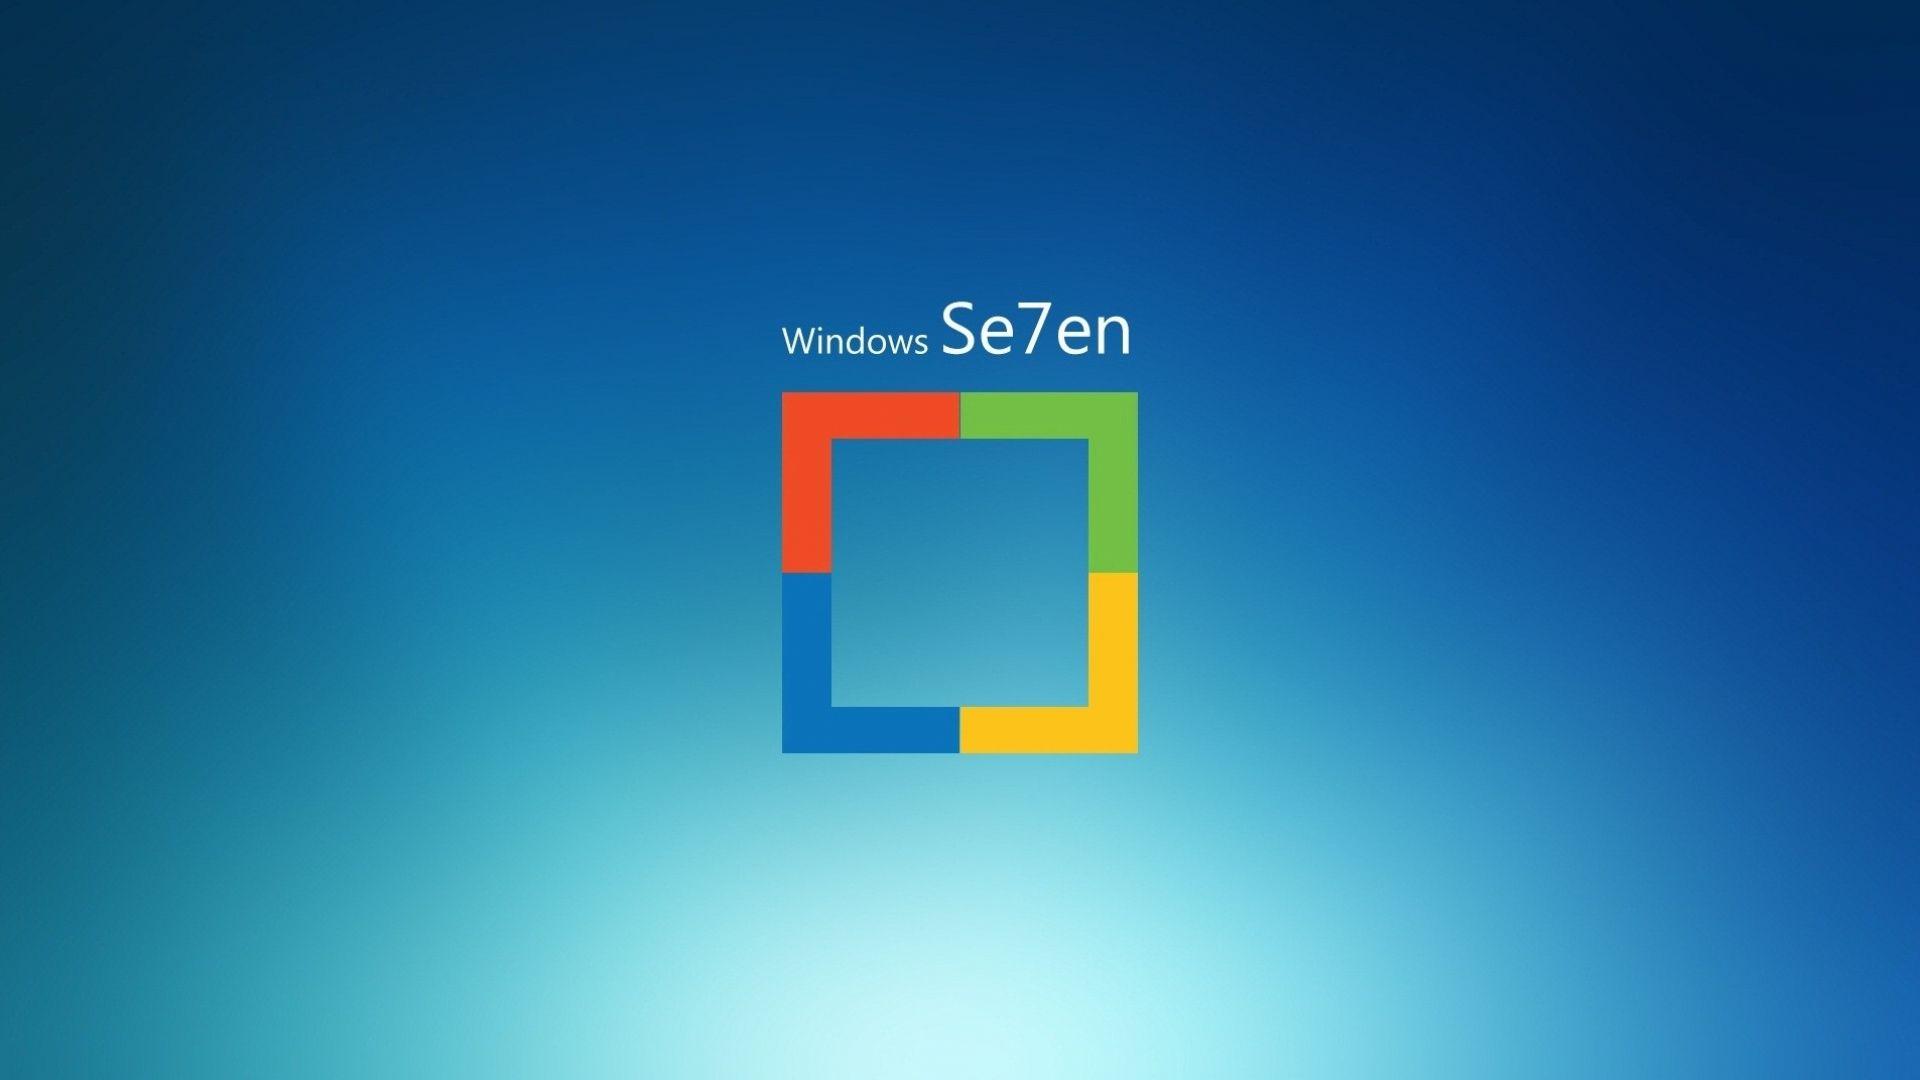 Full Hd P Windows Wallpapers Hd Desktop Backgrounds Windows Desktop Wallpaper System Wallpaper Hd Ipad Wallpapers